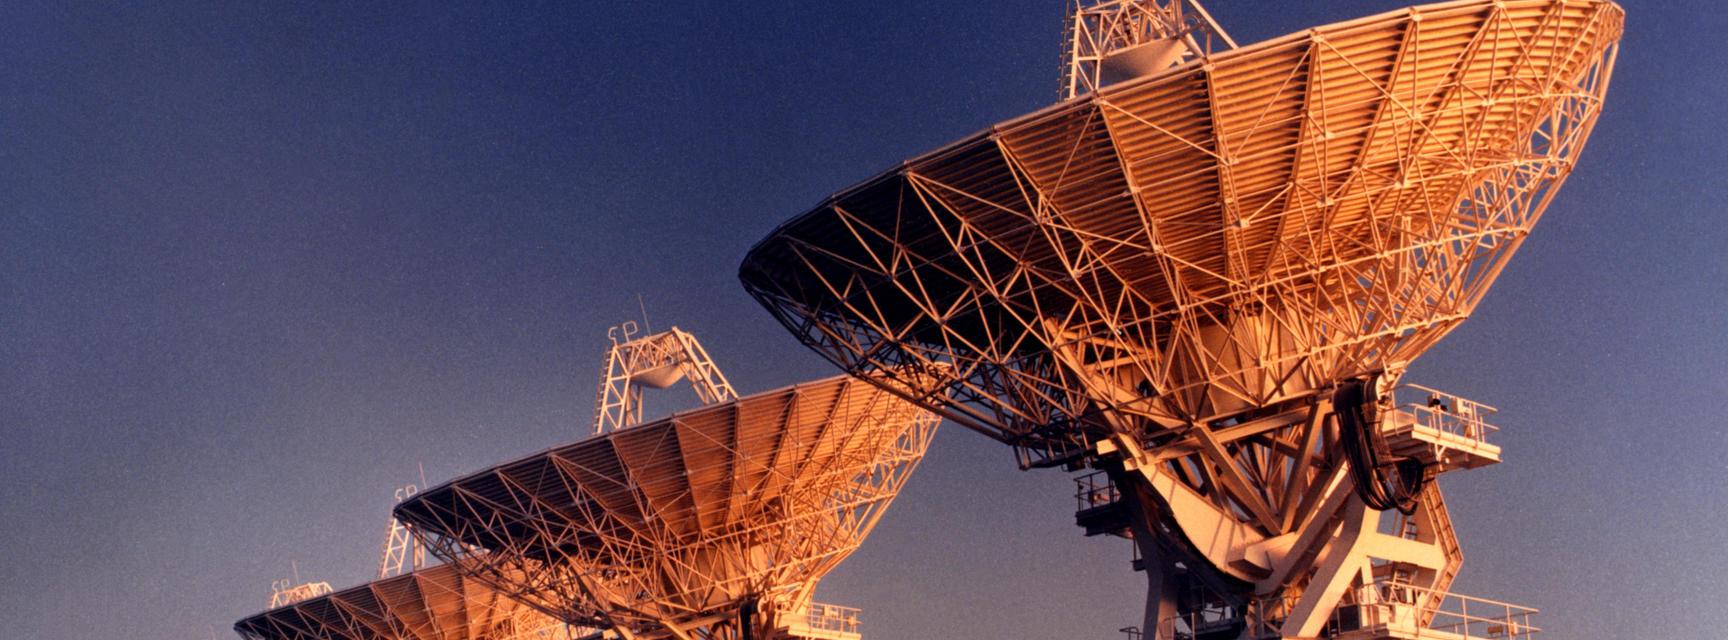 ska telescopes2